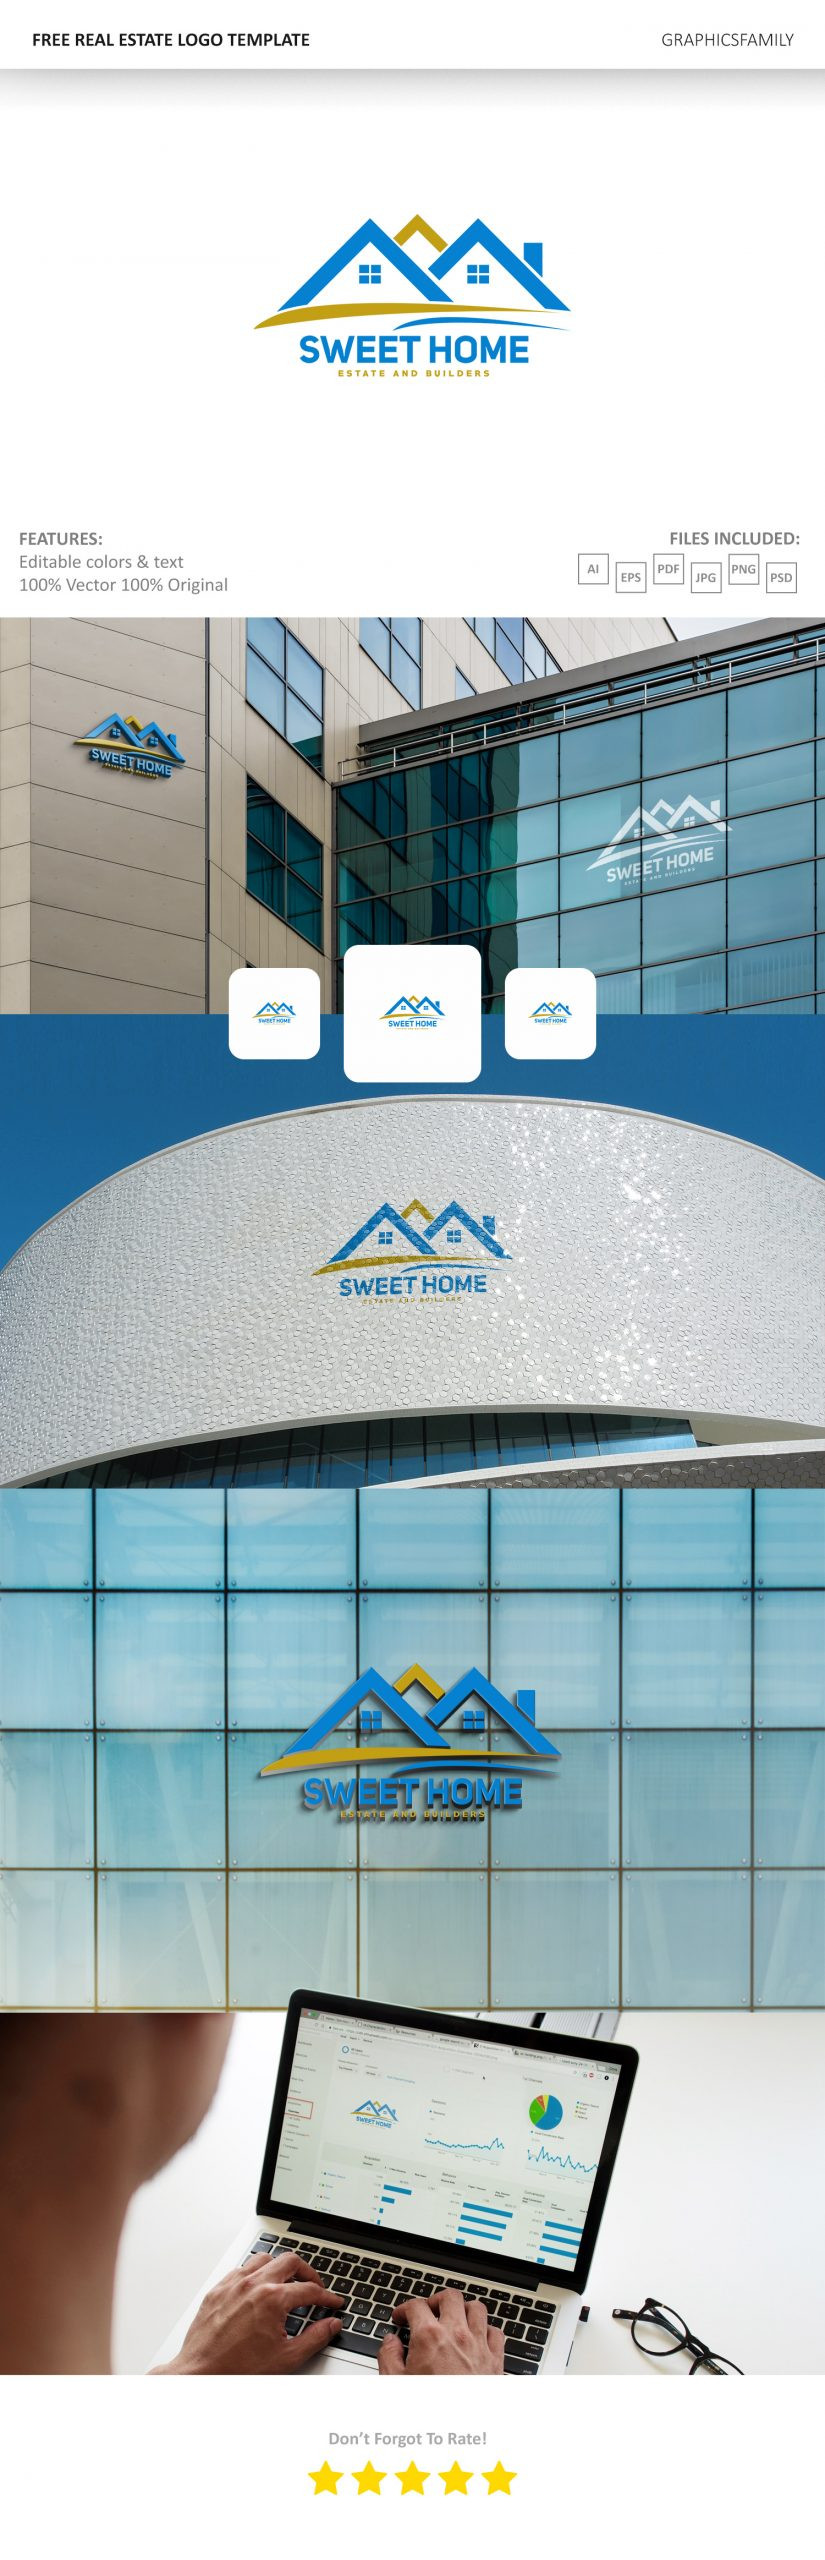 🏨 Free Download Real Estate Logo Template